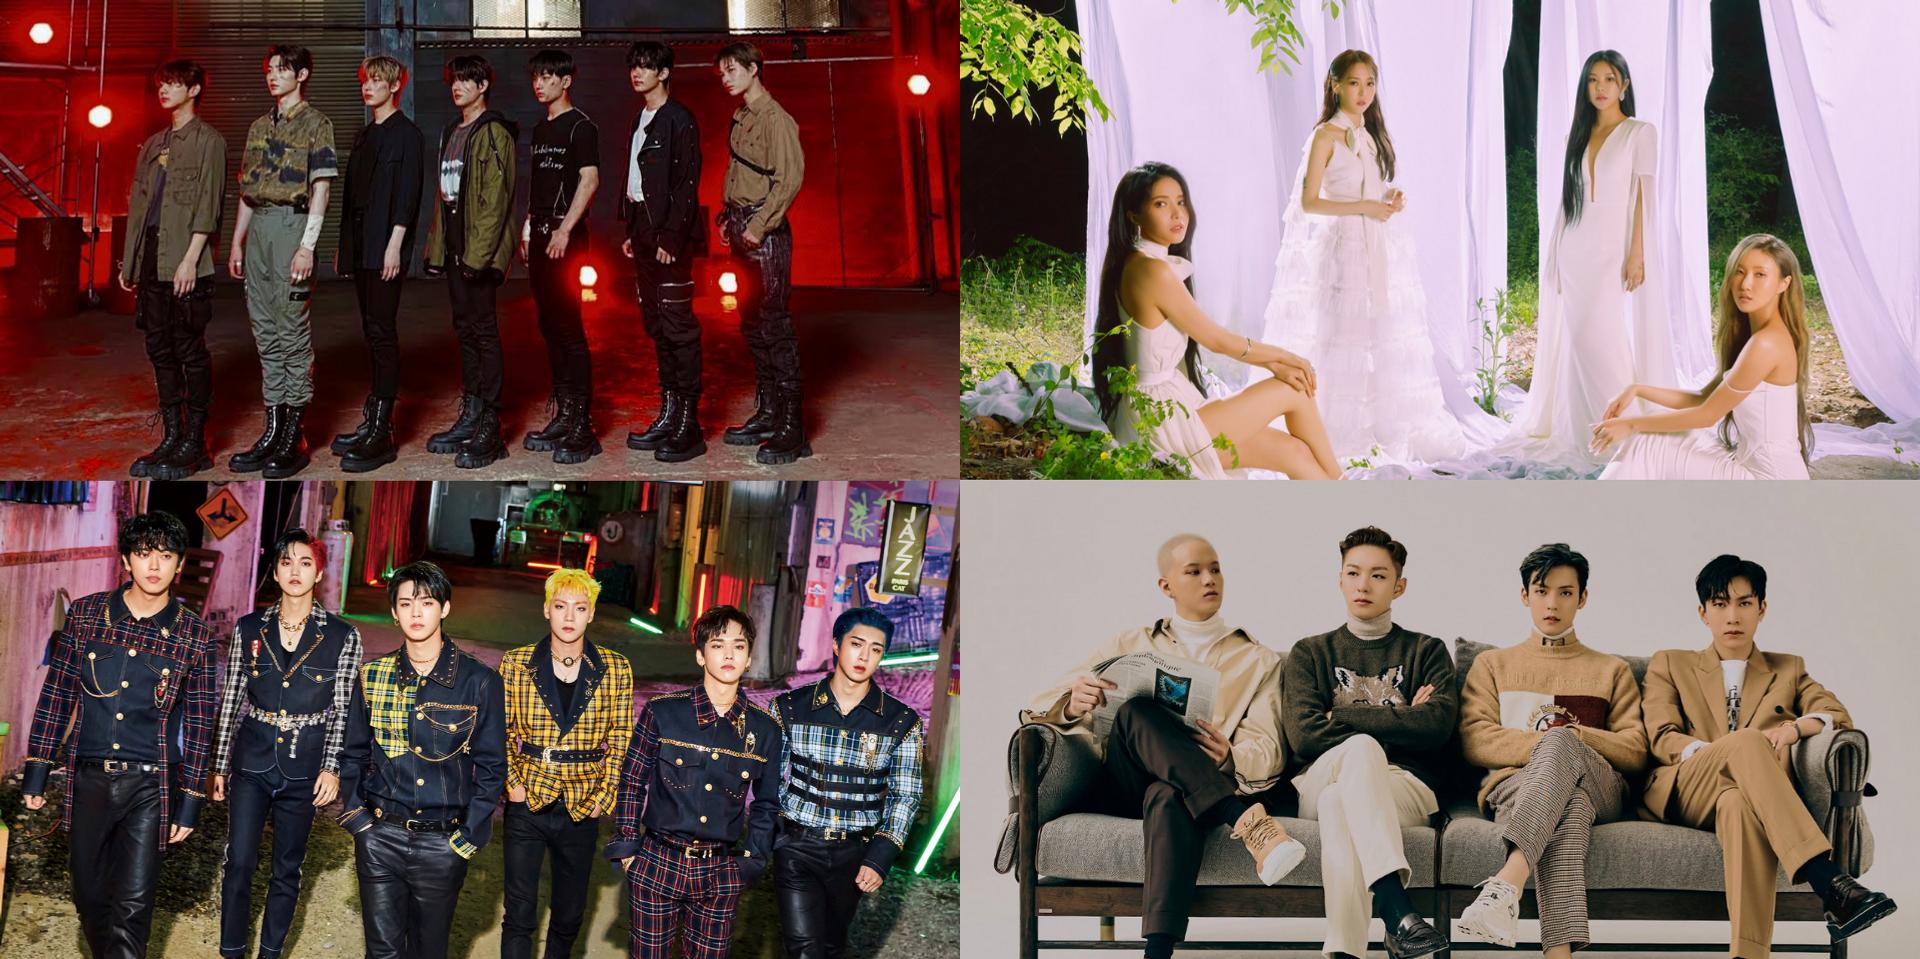 KCON:TACT HI 5 announce lineup: ENHYPEN, MAMAMOO, BTOB, ONF, and more